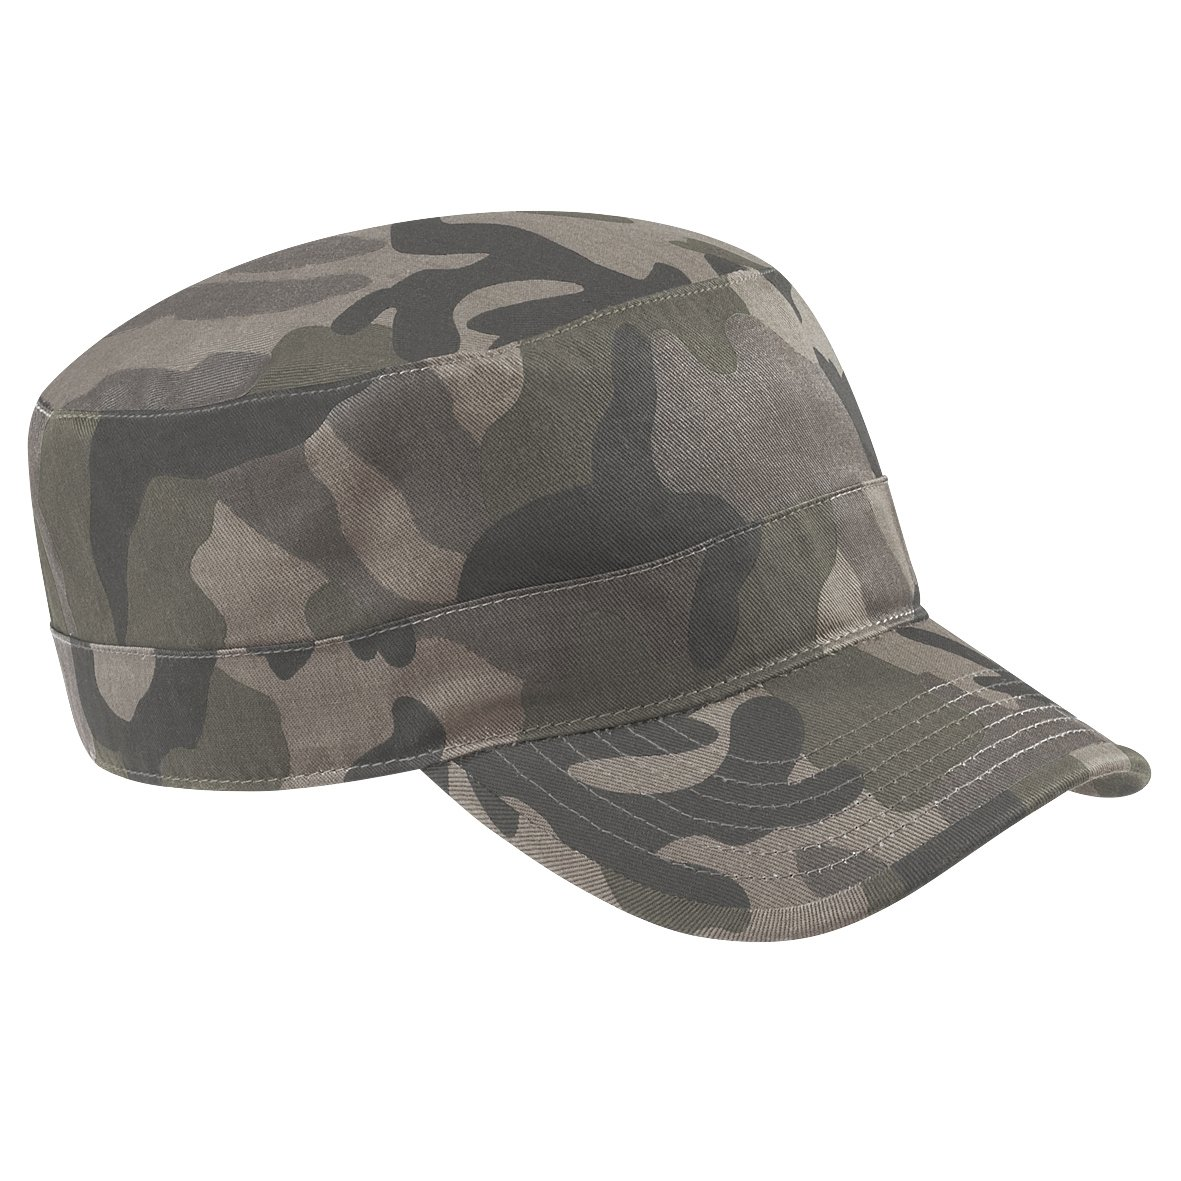 Beechfield Casquette camouflage style arm/ée 100/% coton